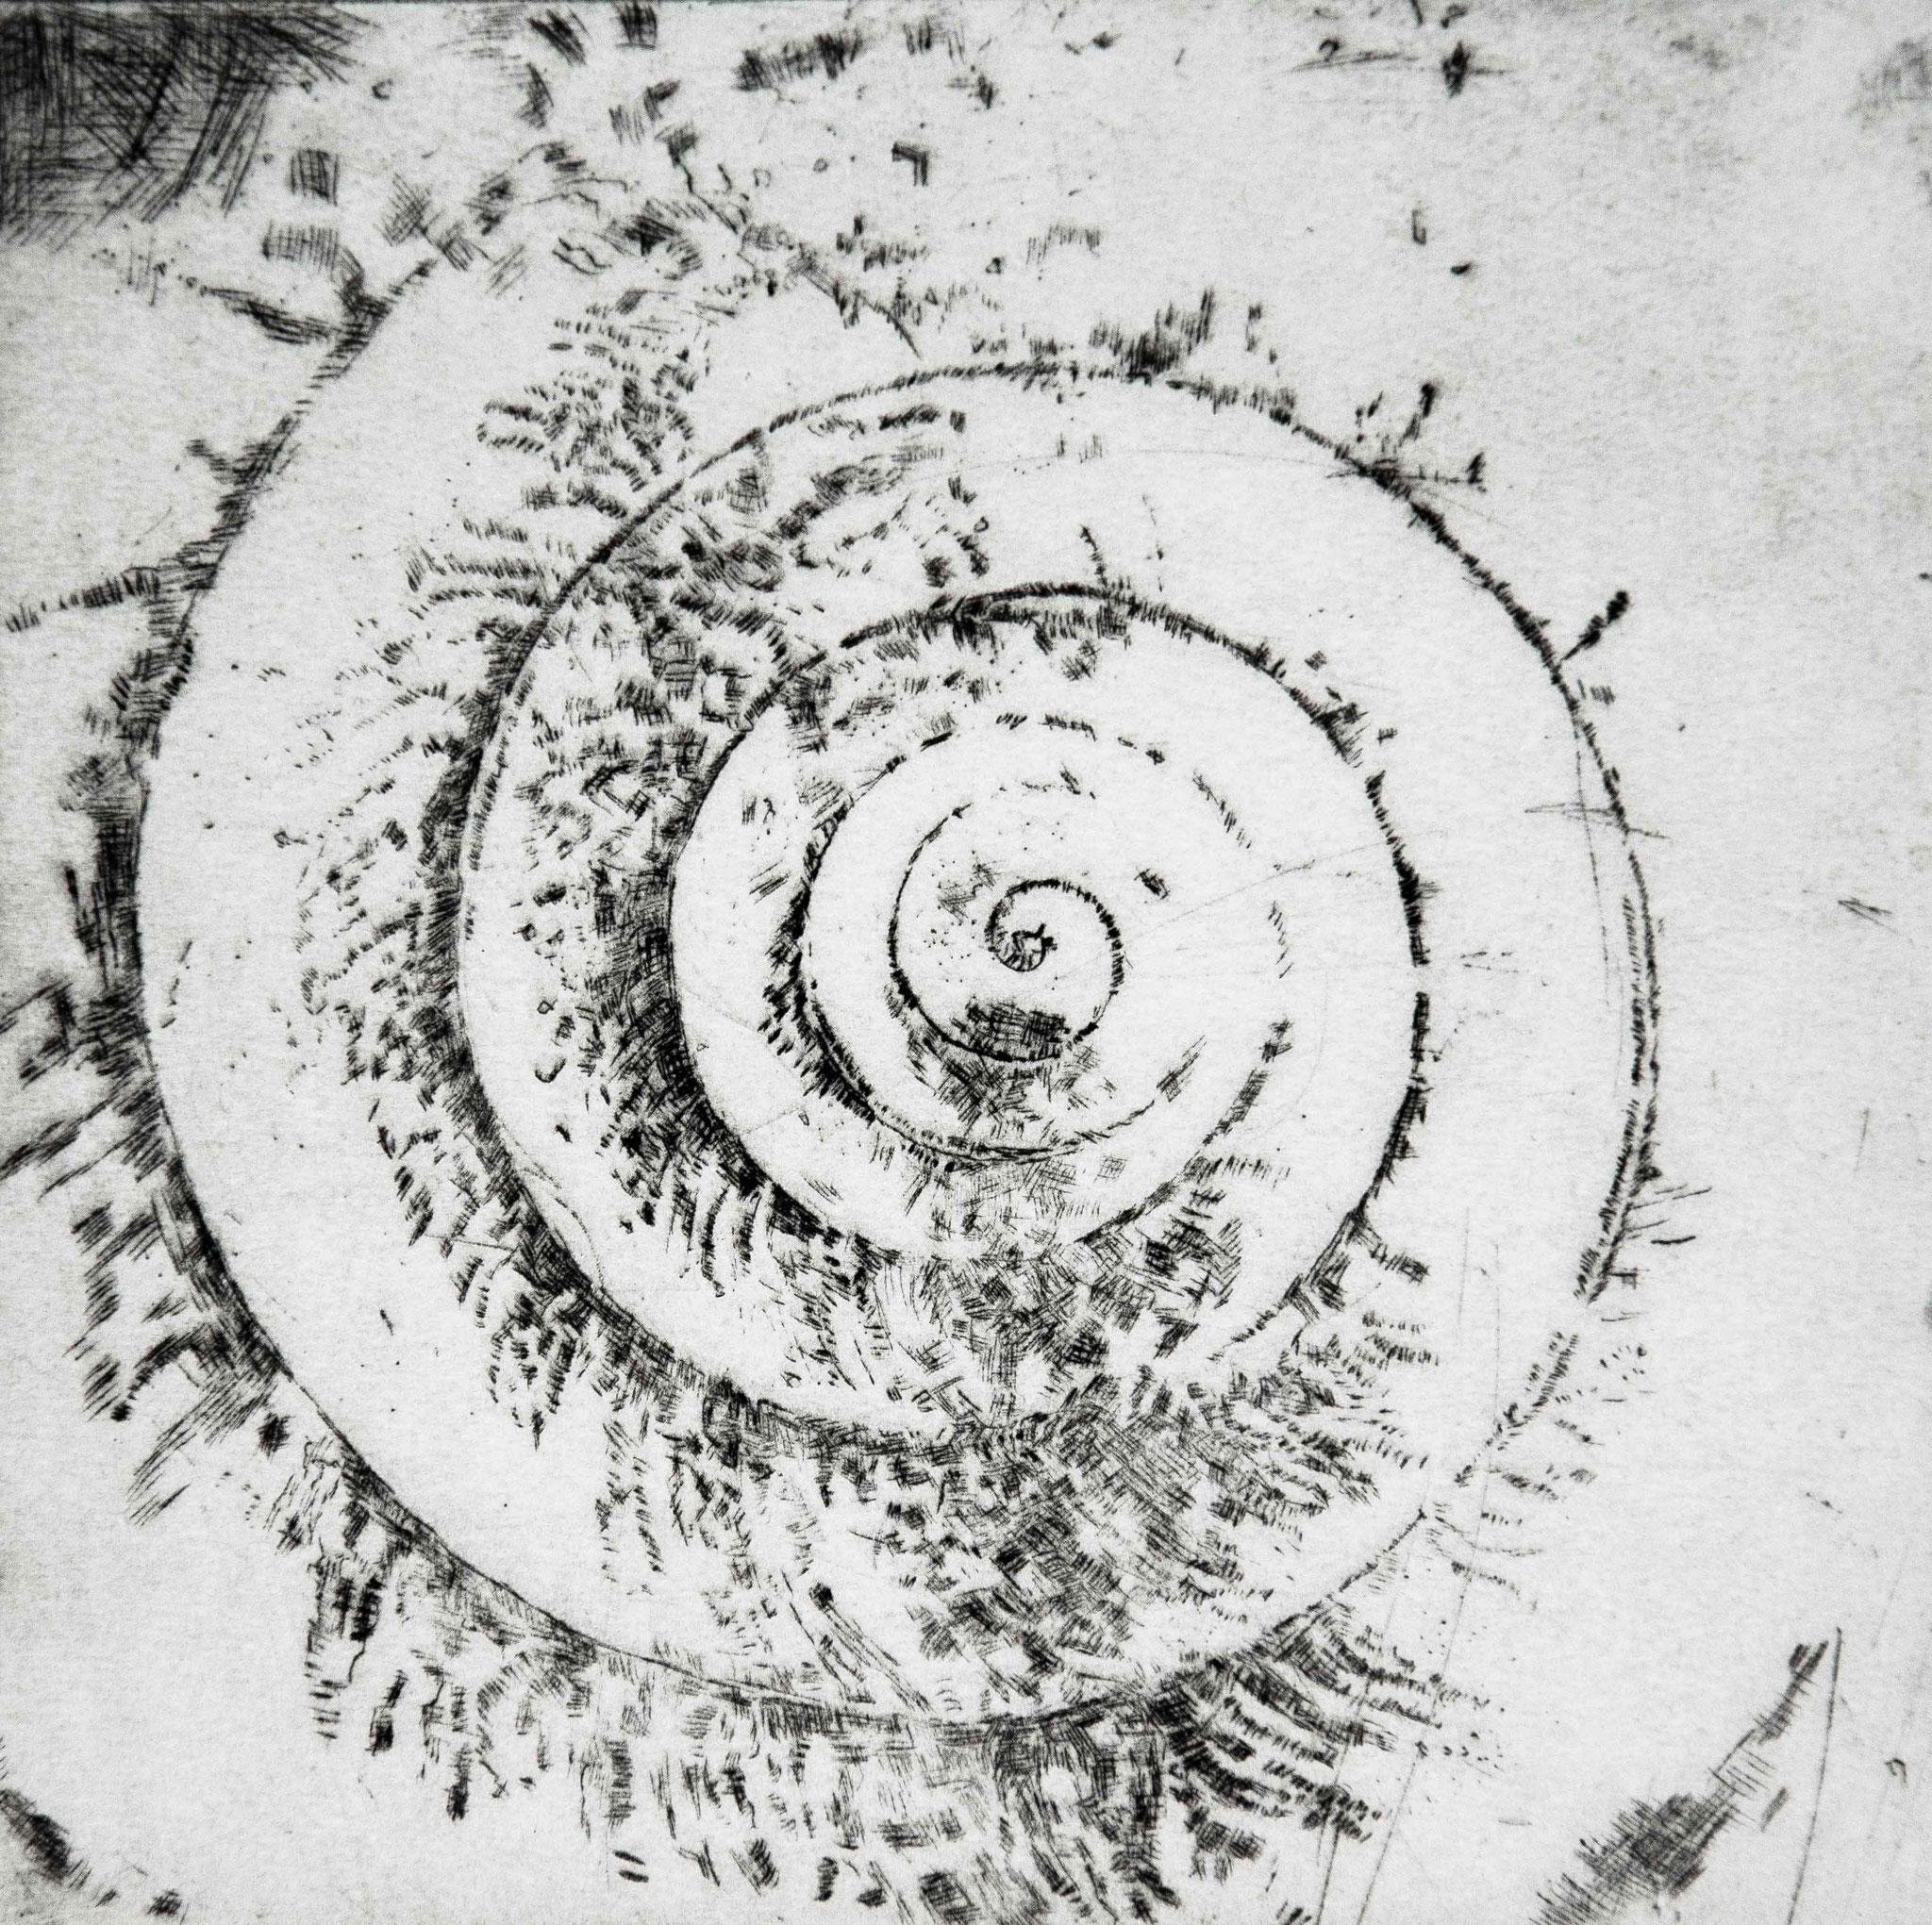 Kaltnadelradierung, 15x15 cm